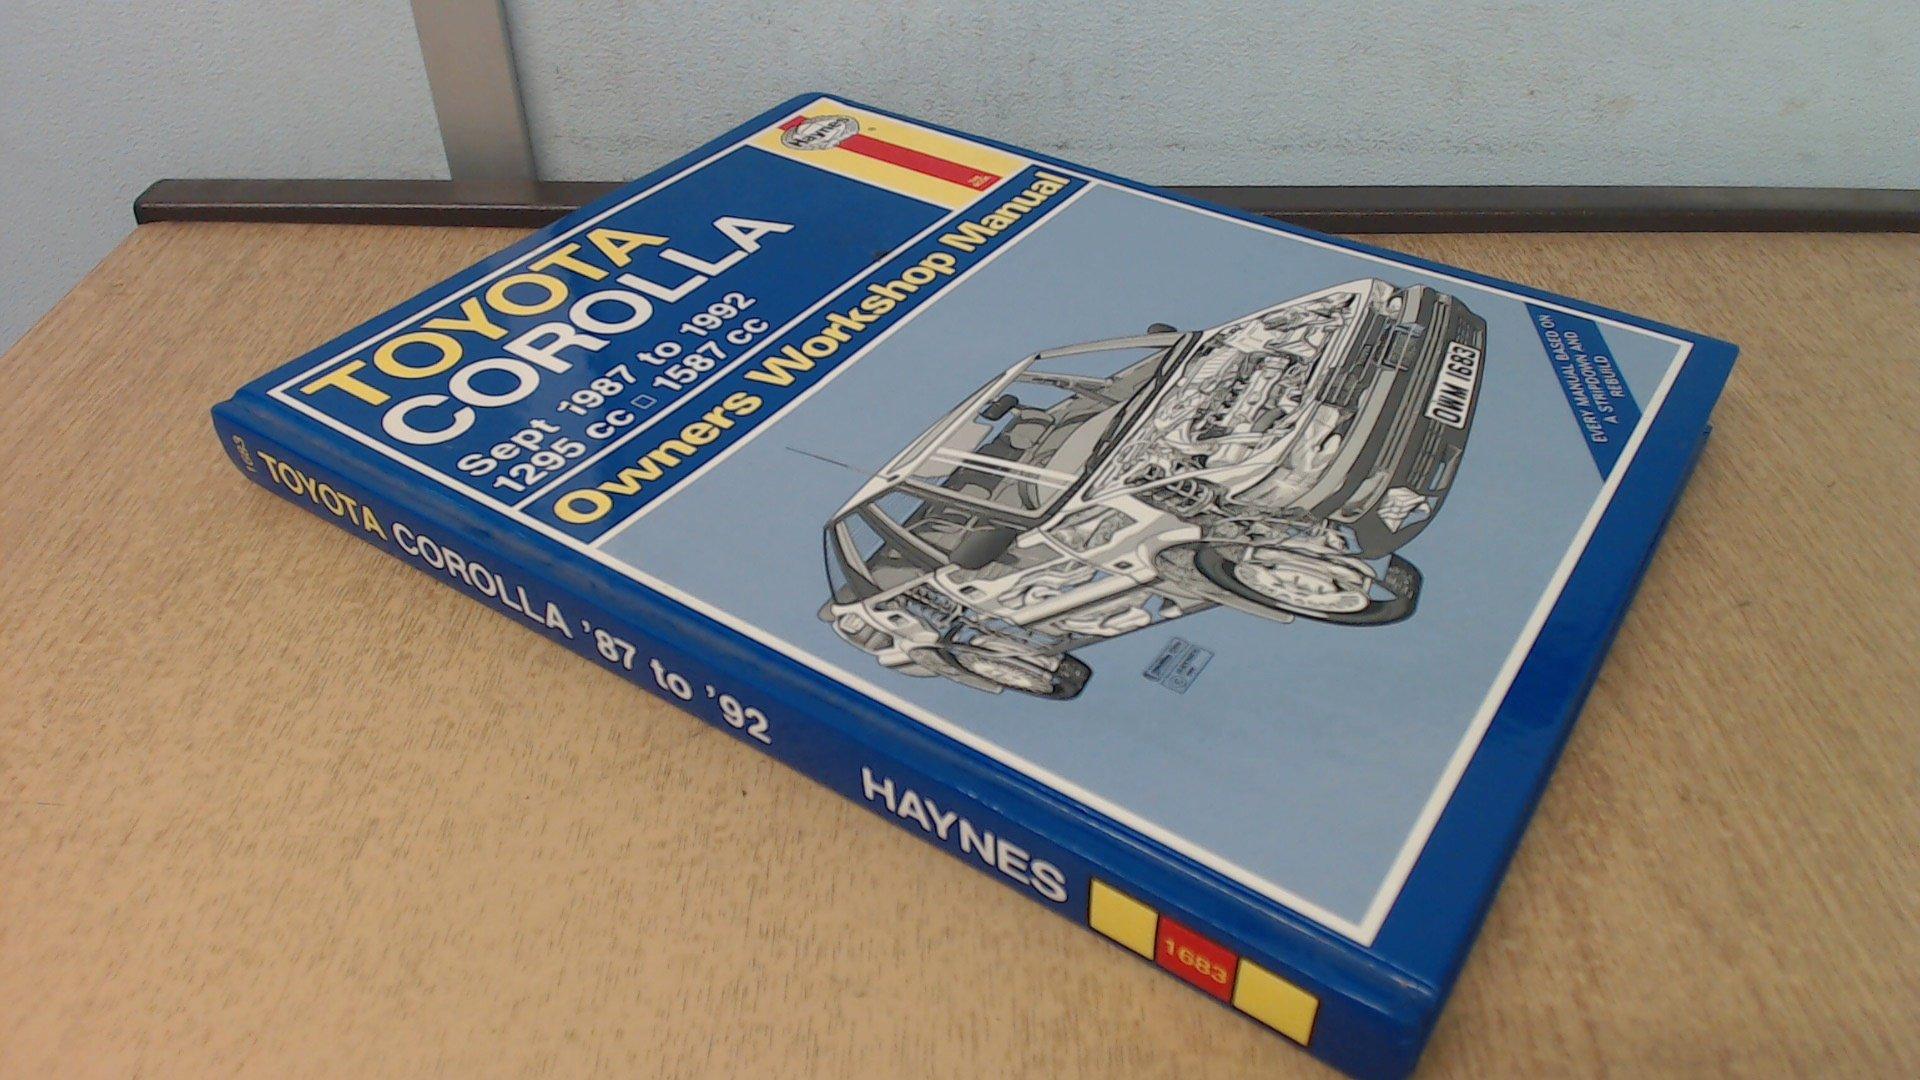 toyota corolla 1987 92 owner s workshop manual service repair rh amazon com Toyota Corolla Maintenance Toyota Corolla Service Diagrams